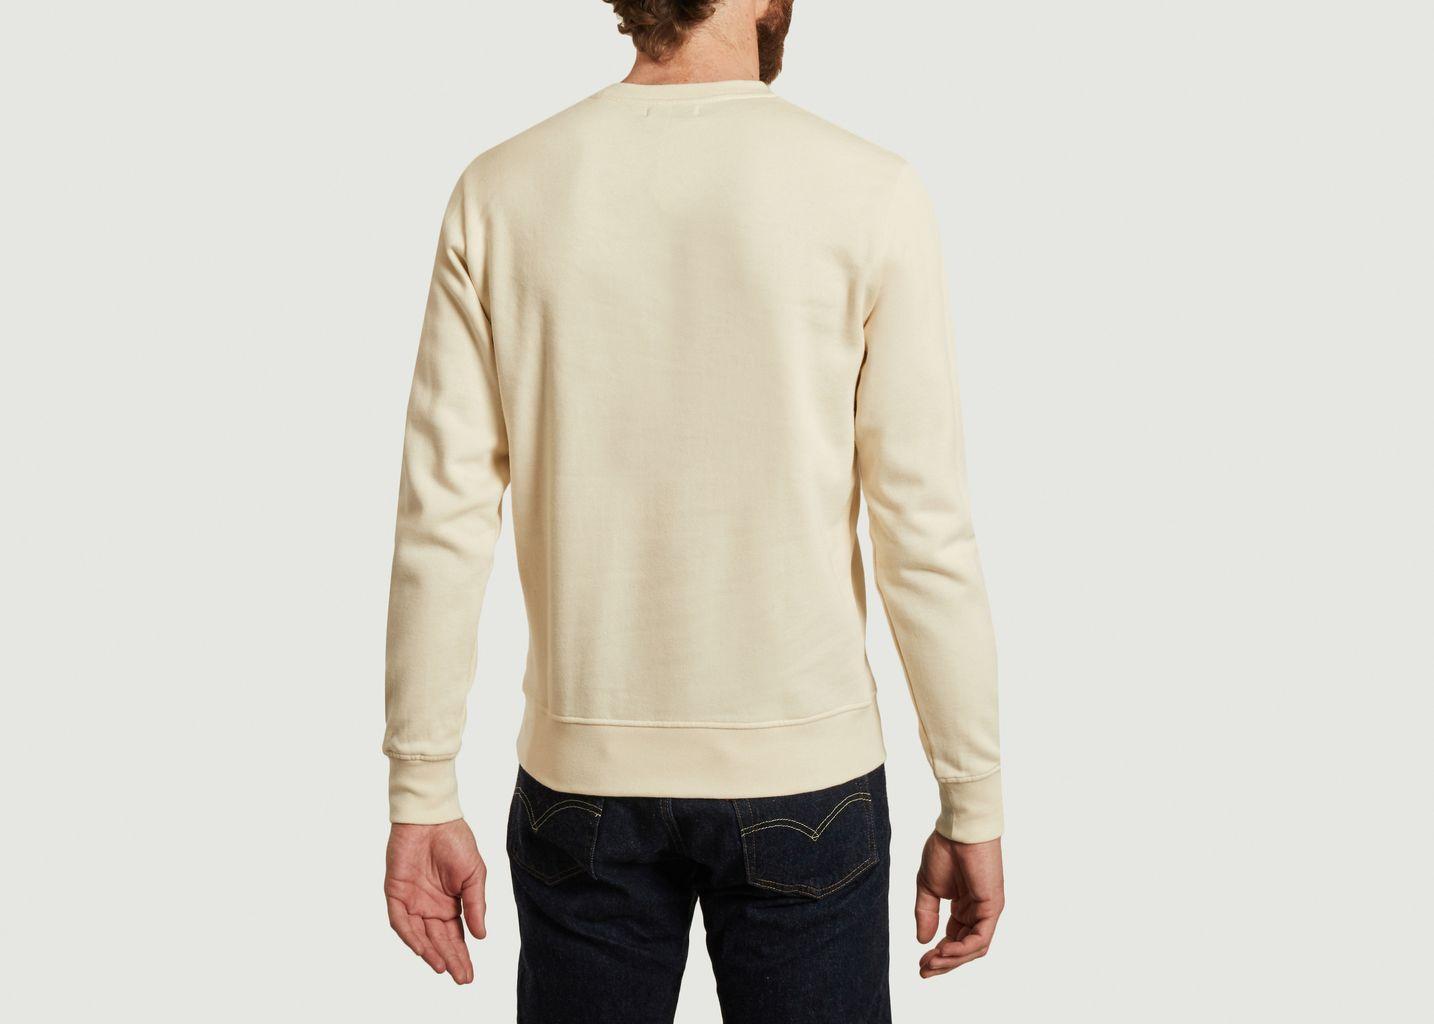 Sweatshirt en coton bio avec broderie Monstera - Olow